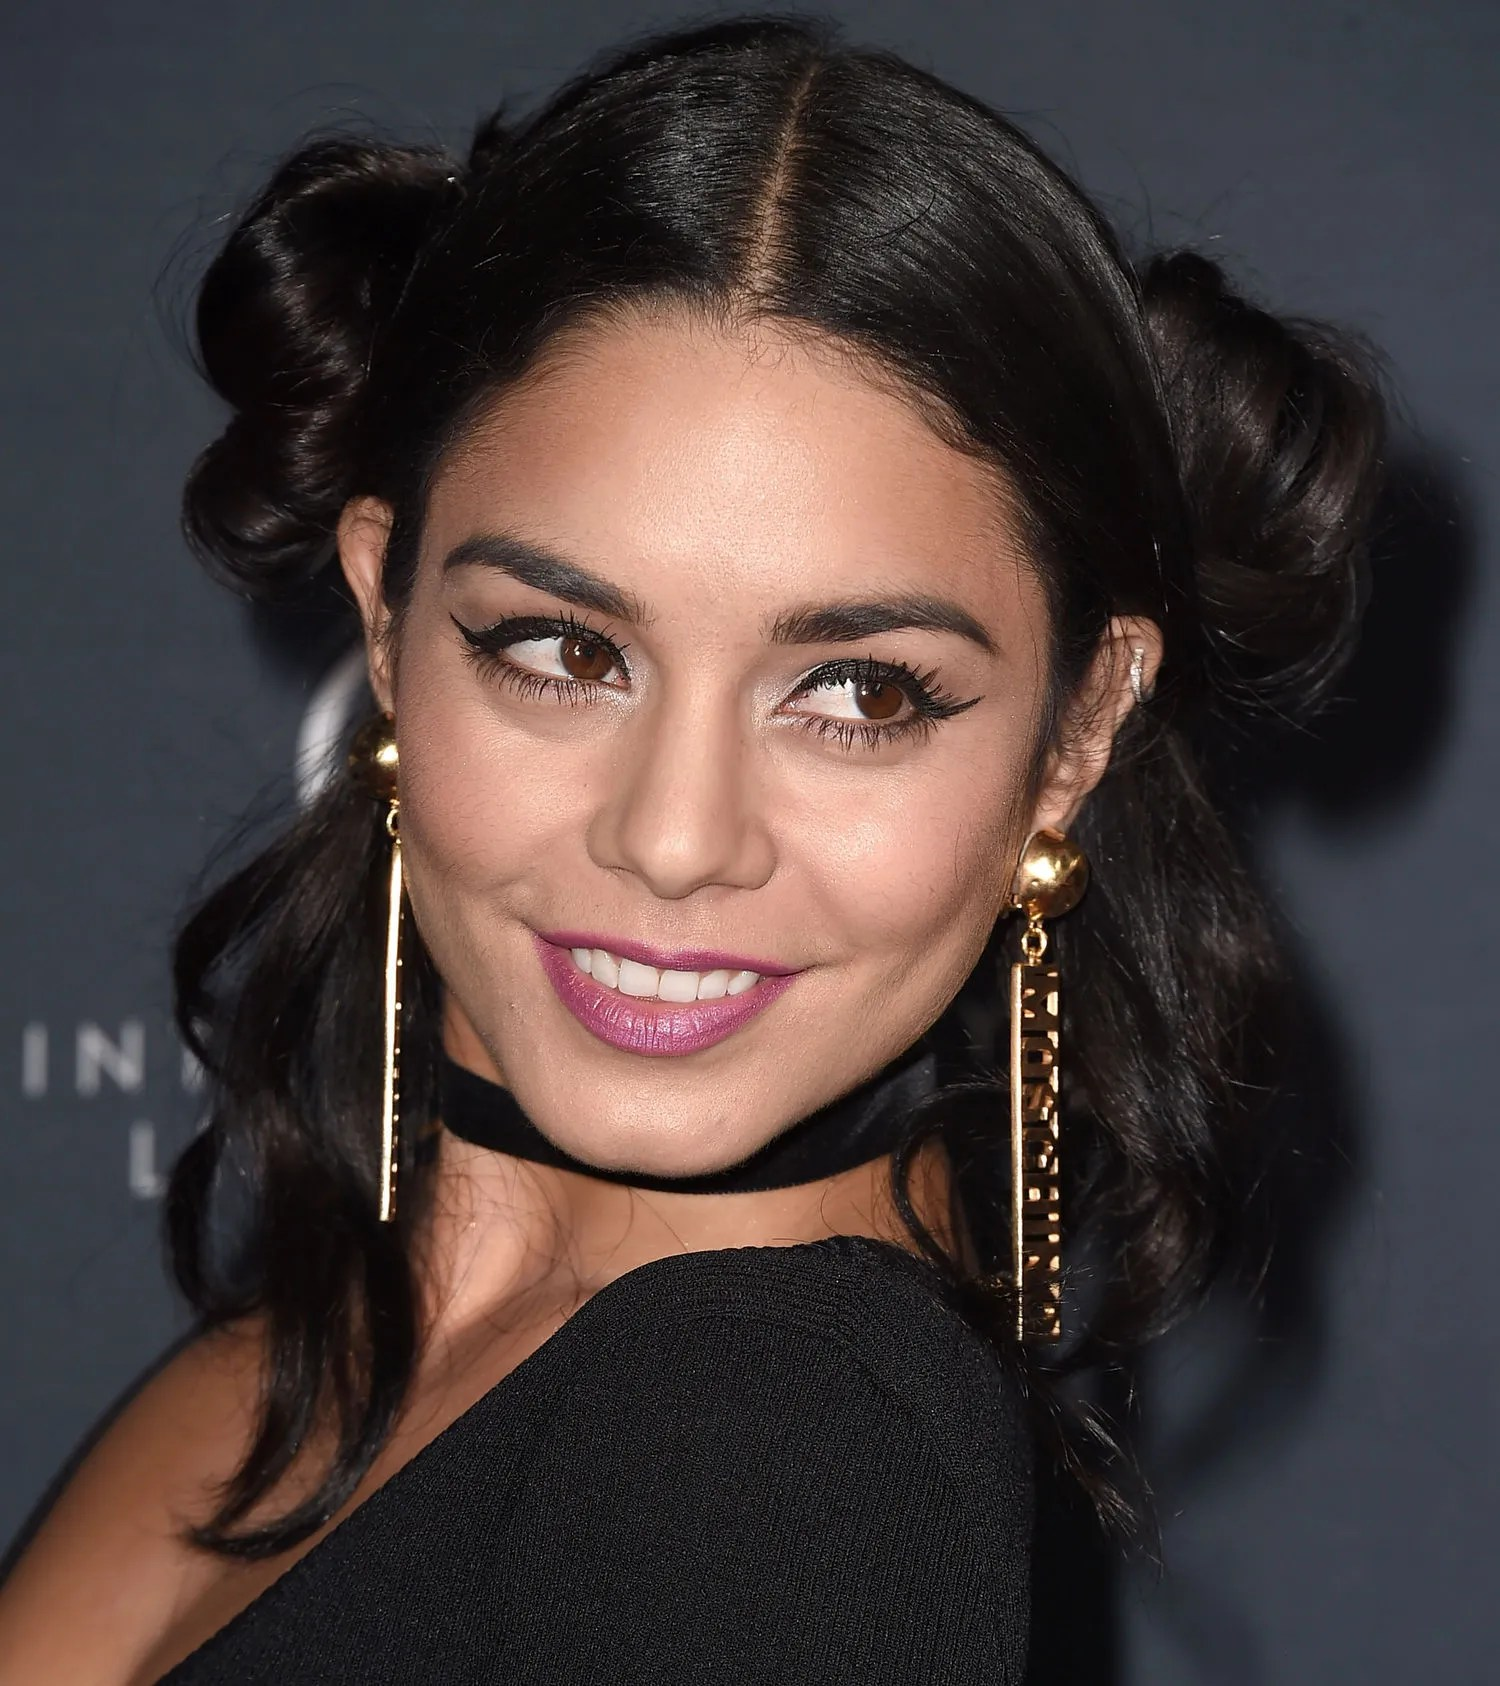 Vanessa Hudgens Wears A Princess Leia Hairstyle Ahead Of